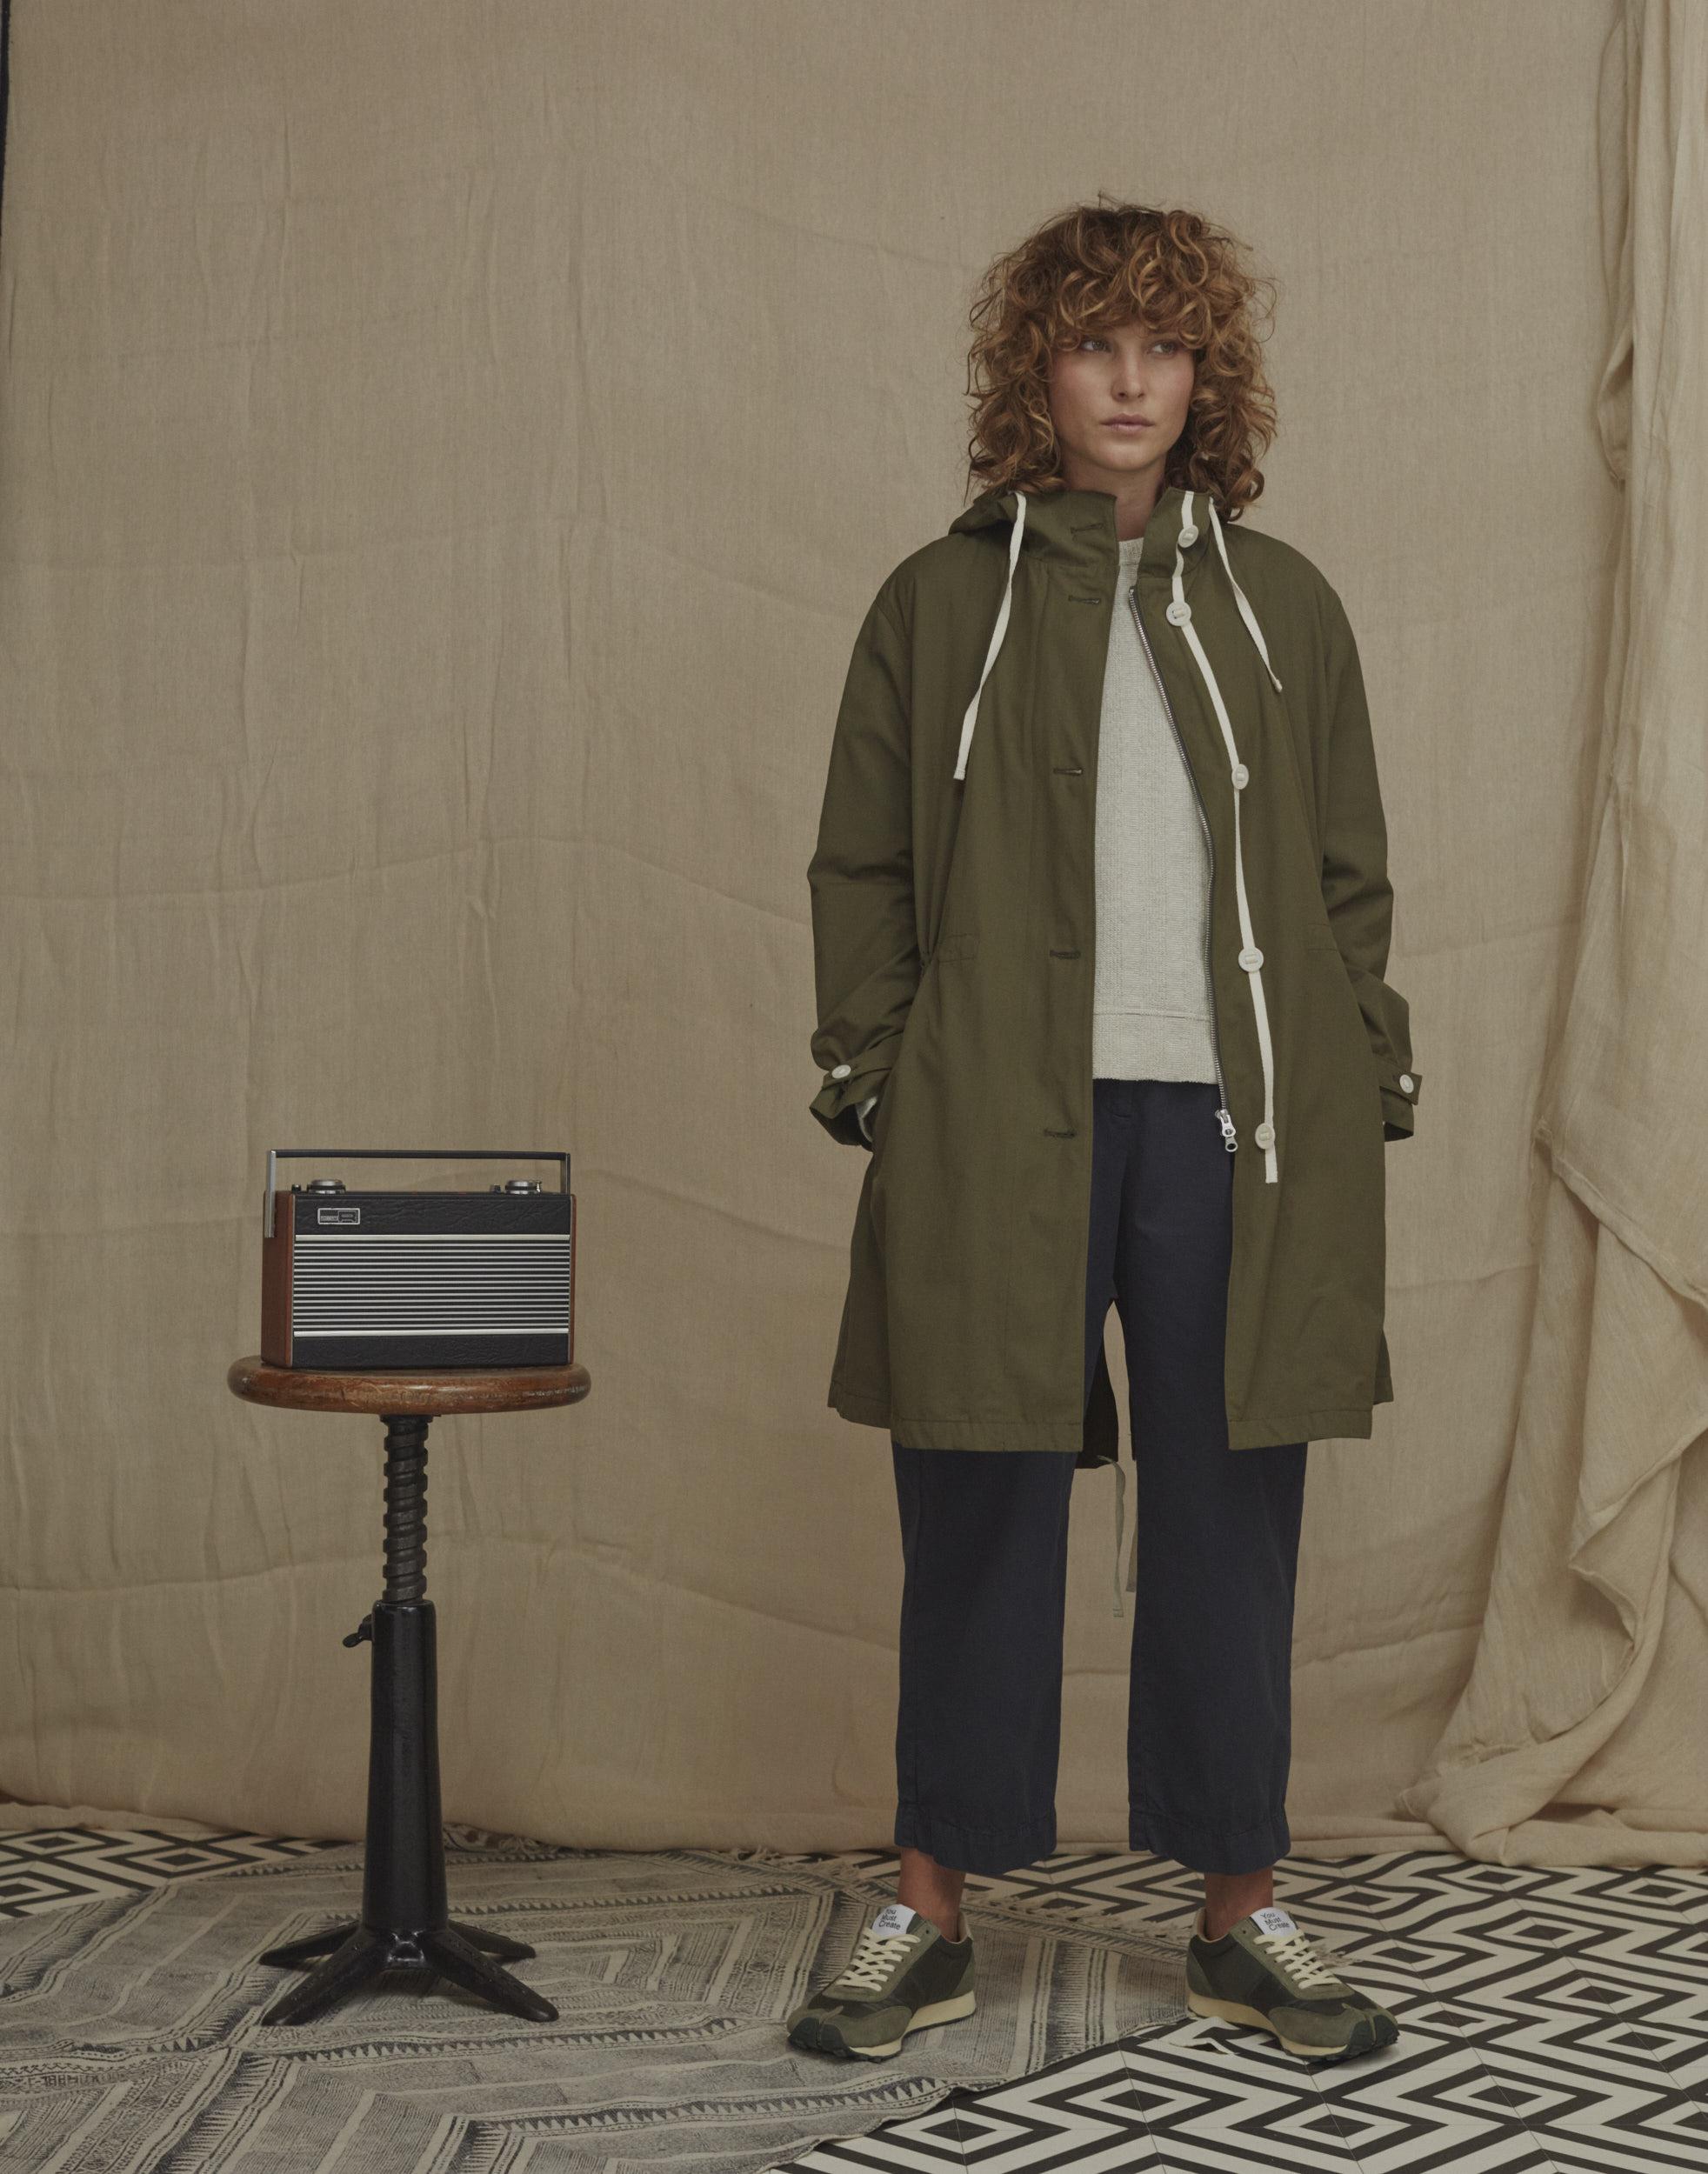 ymc-ss17-collection-okoro-women-fashion-folkr-10